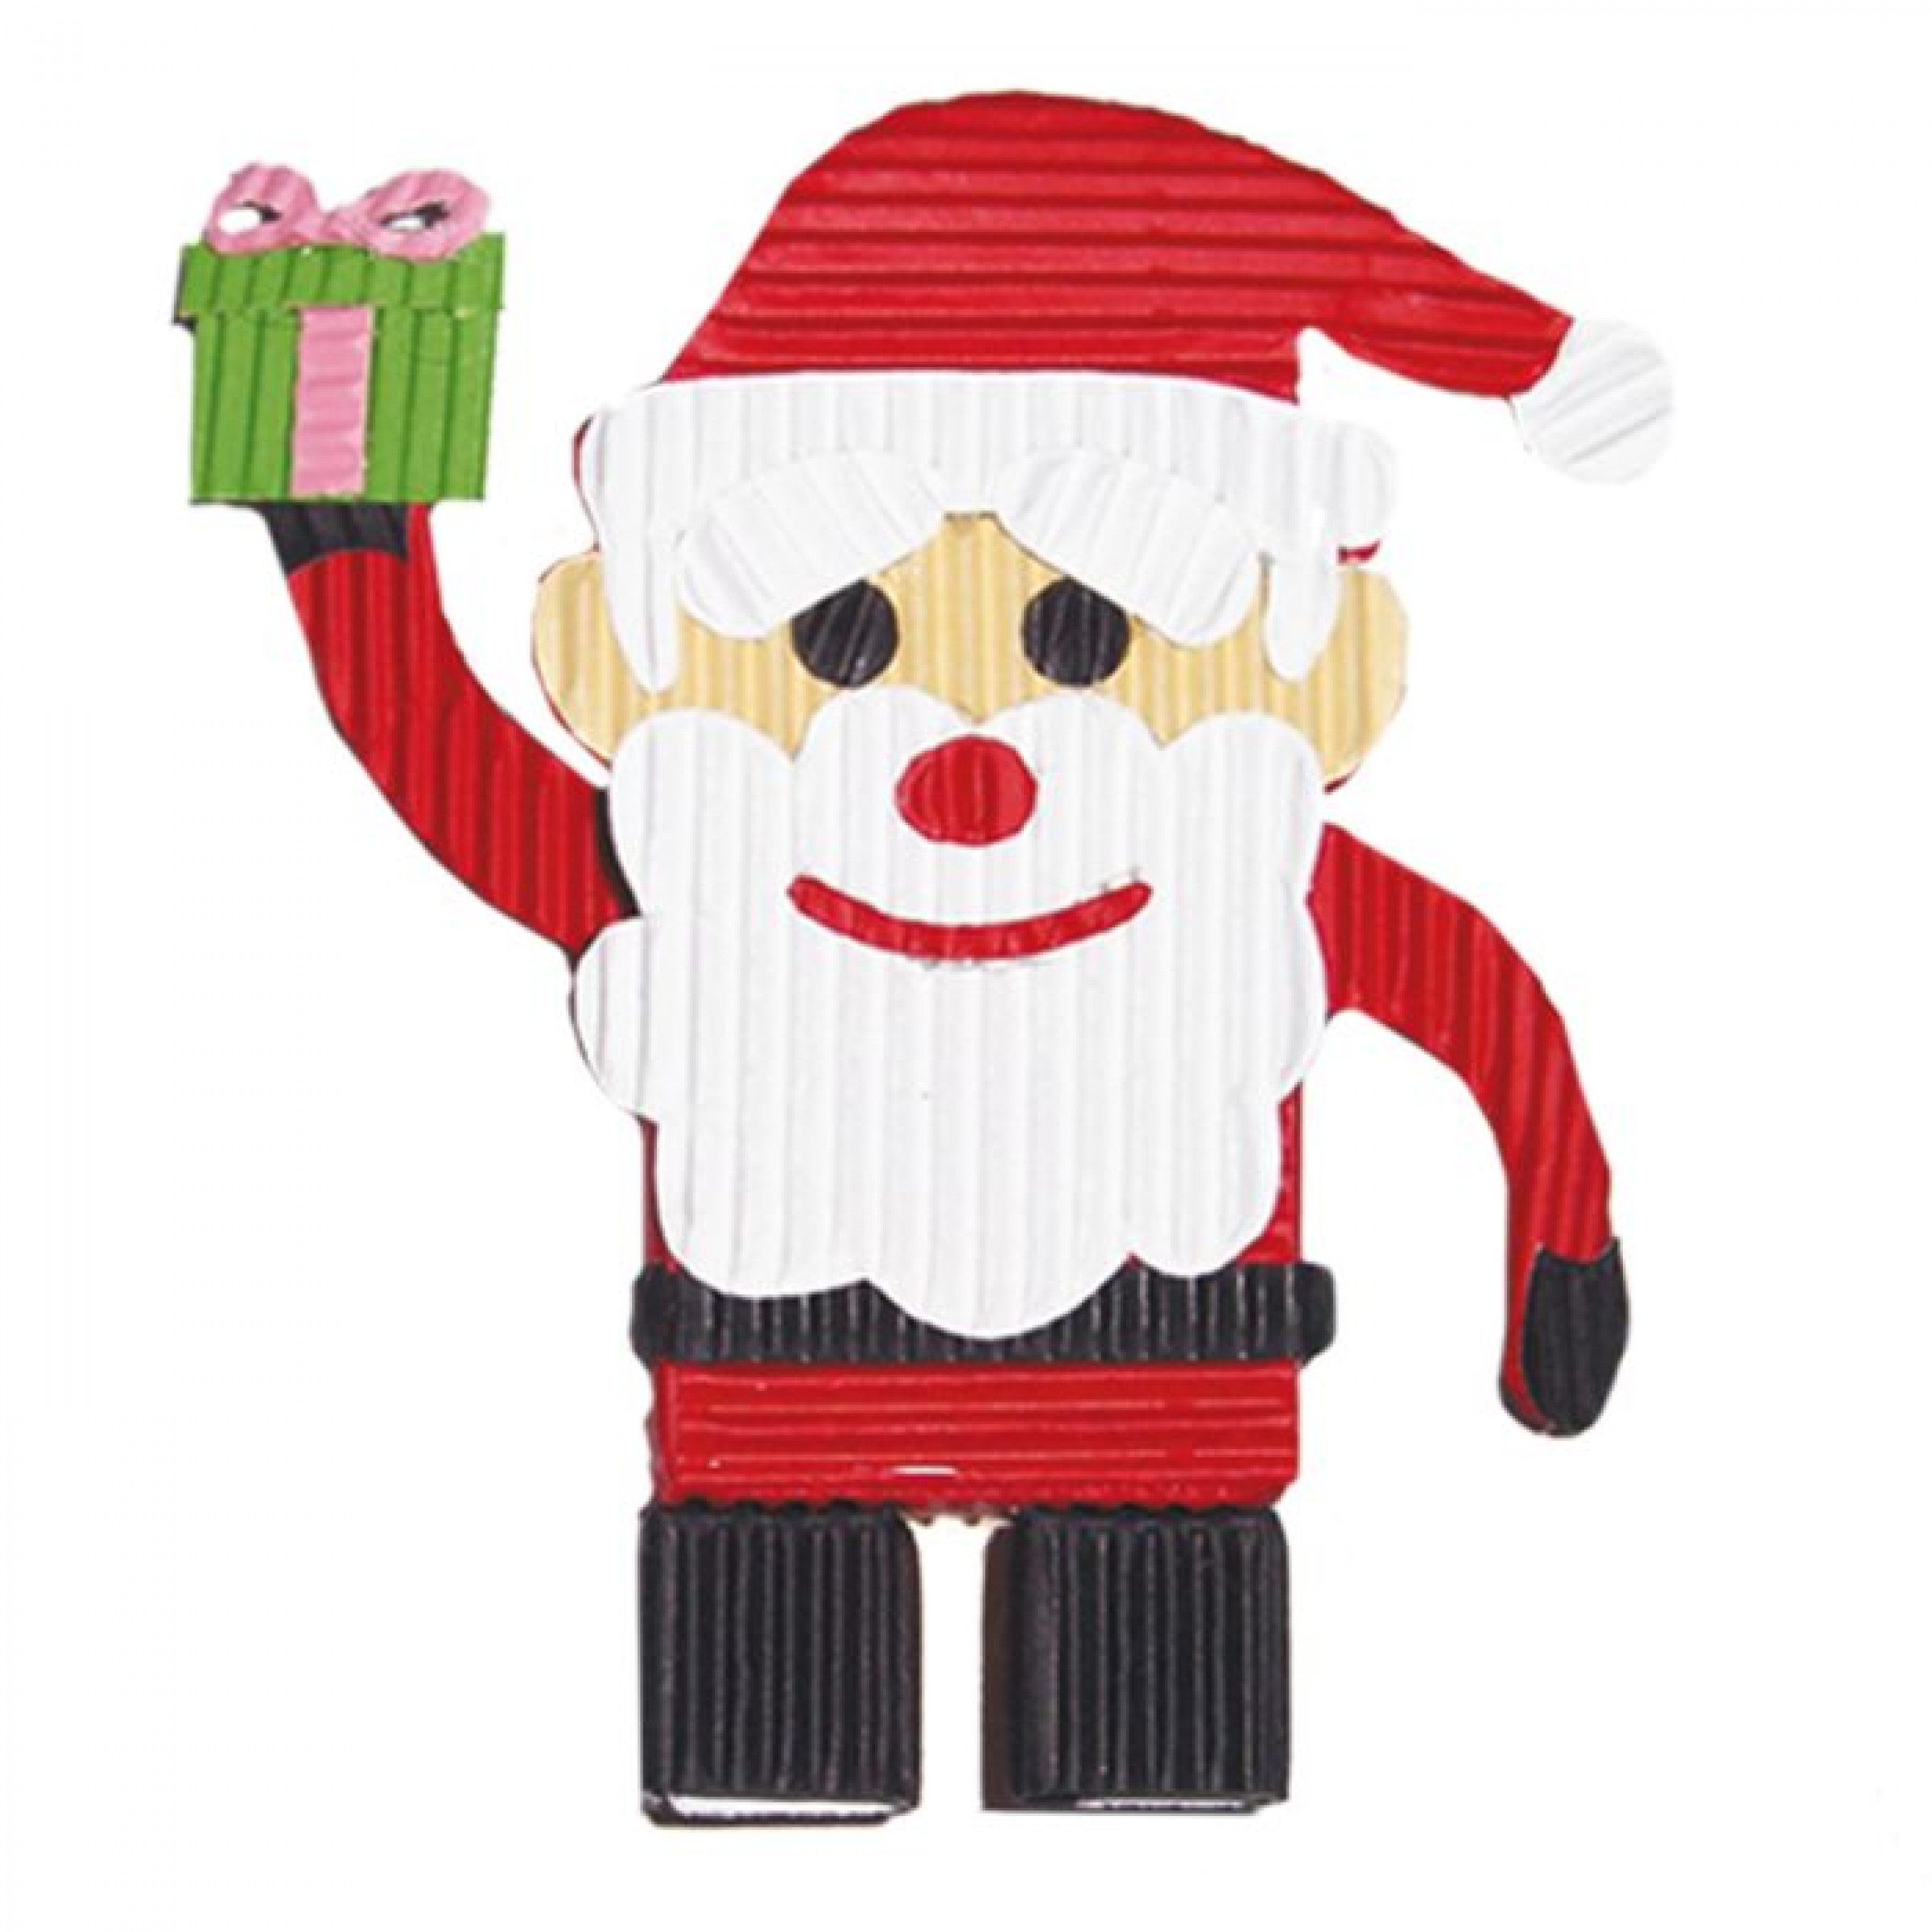 Набор для детского творчества Санта, 1 шт